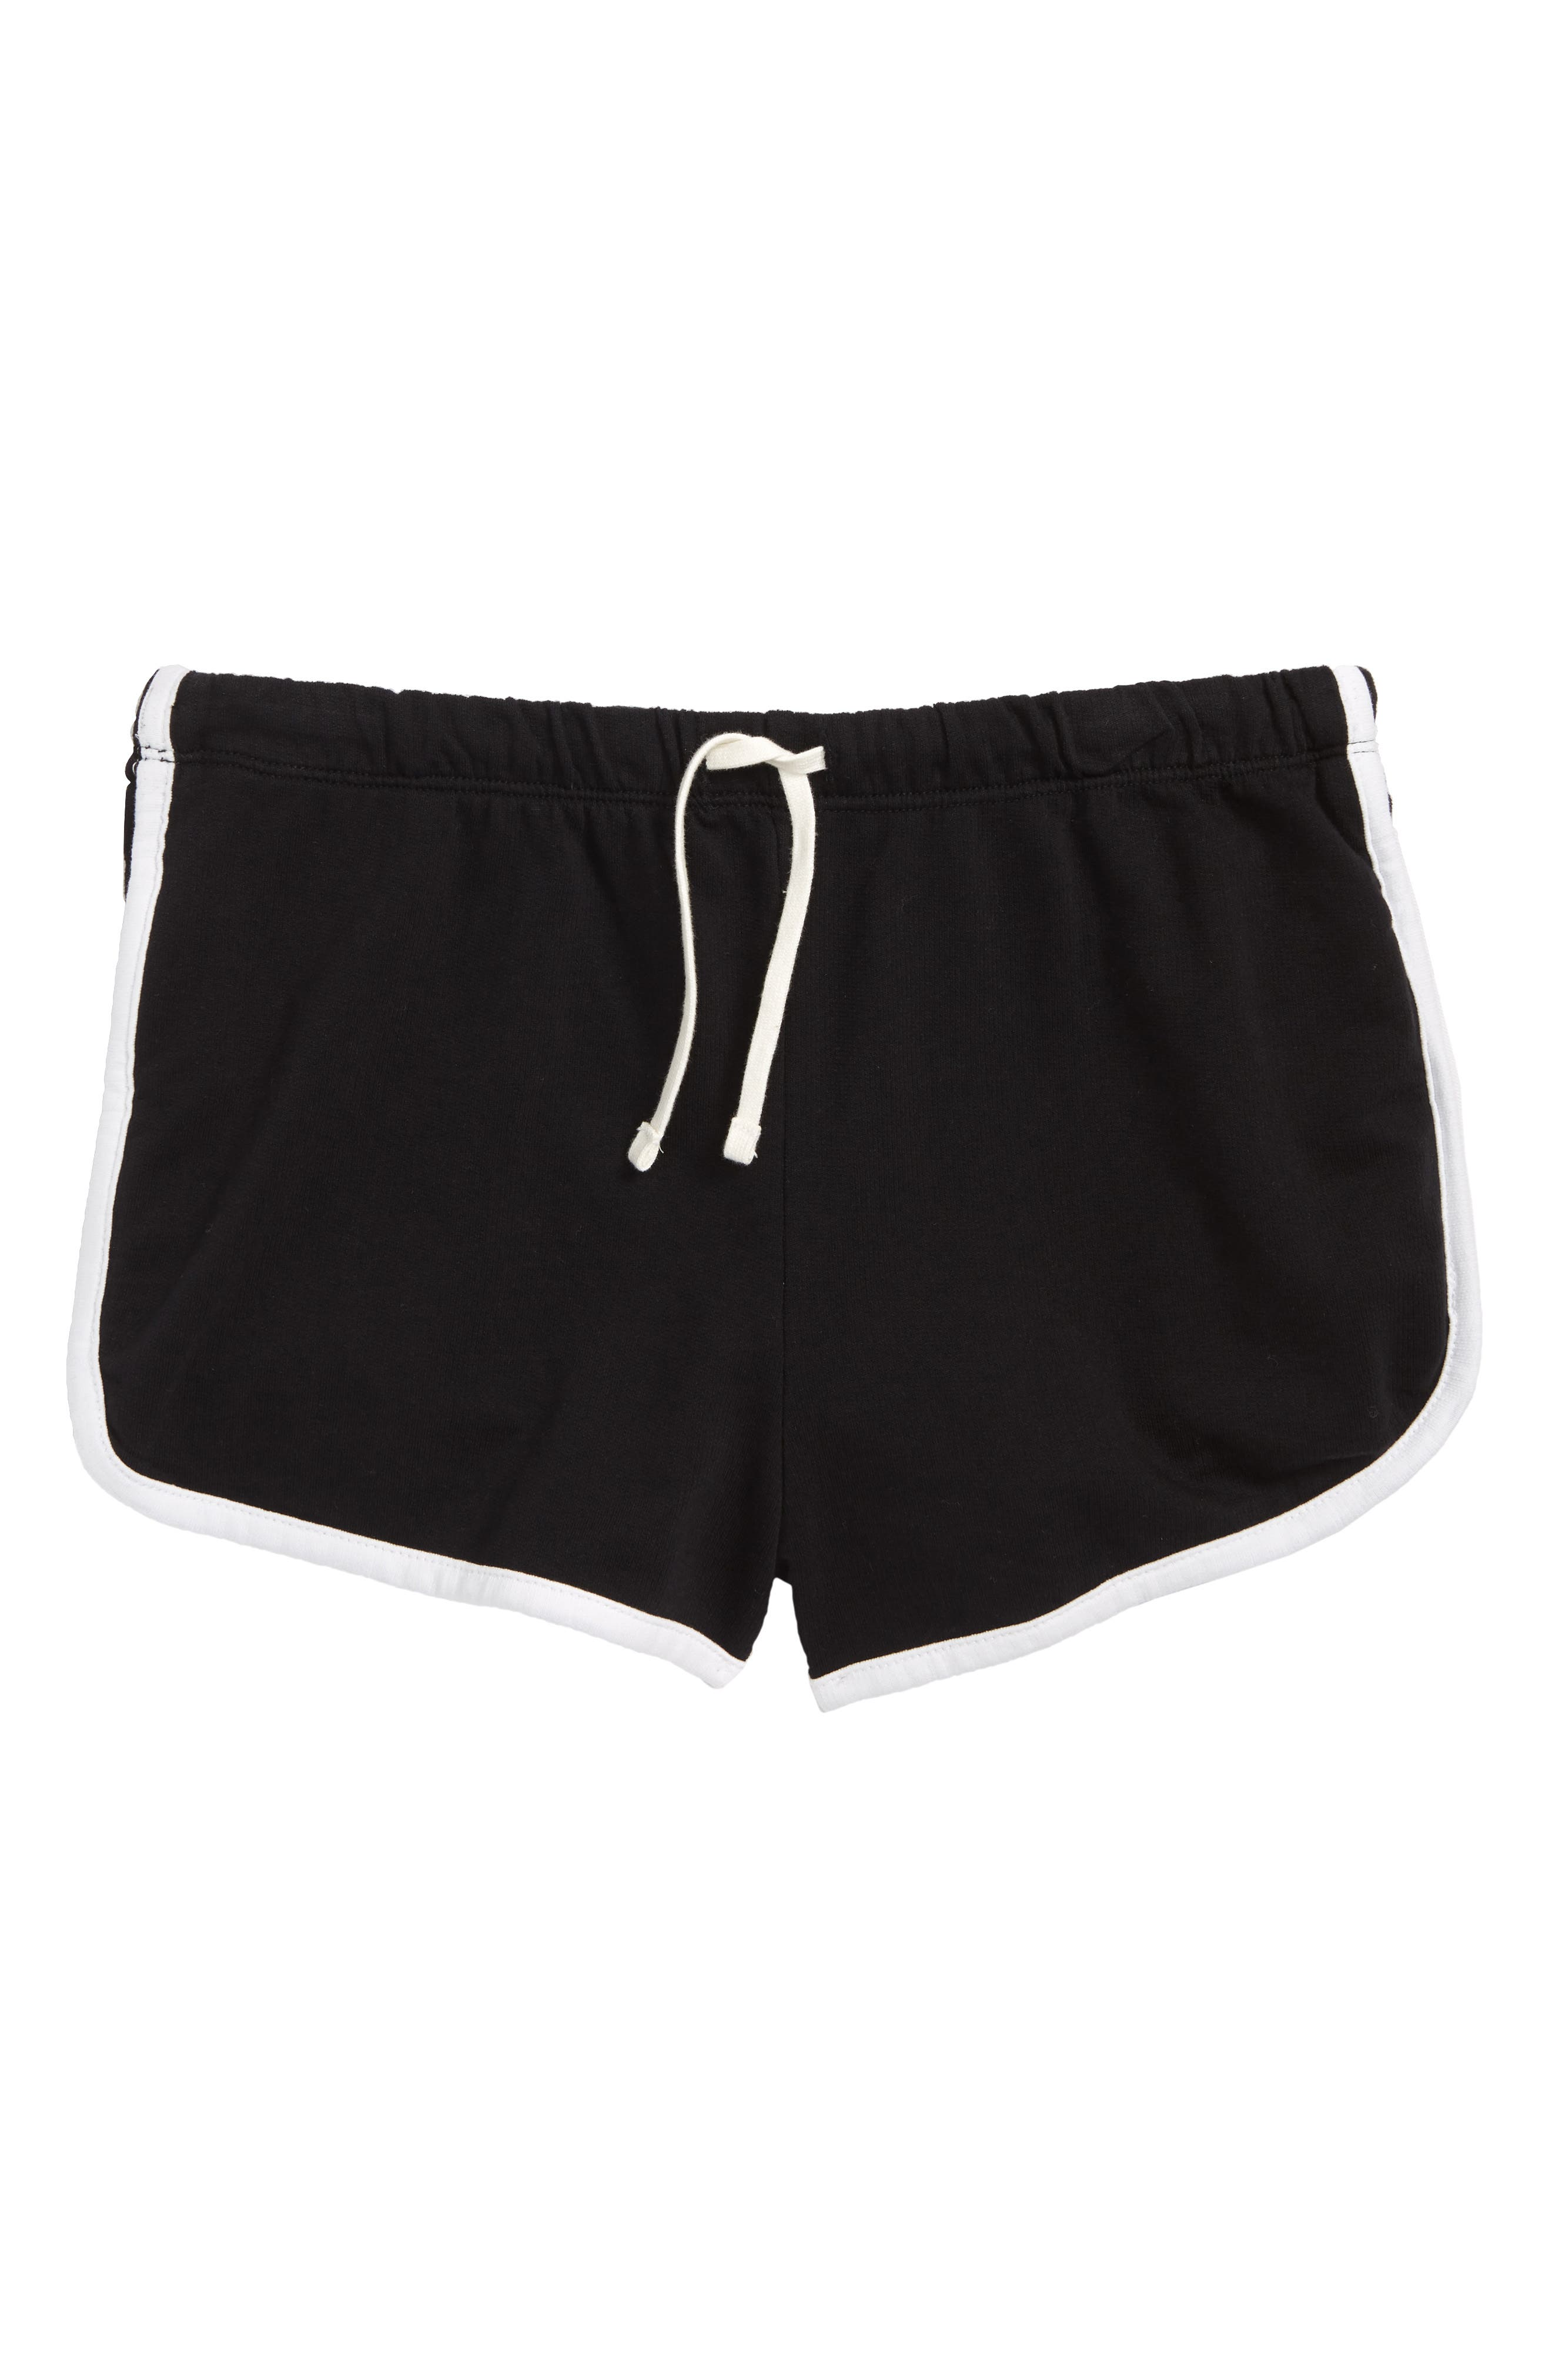 Cotton Dolphin Shorts,                             Main thumbnail 1, color,